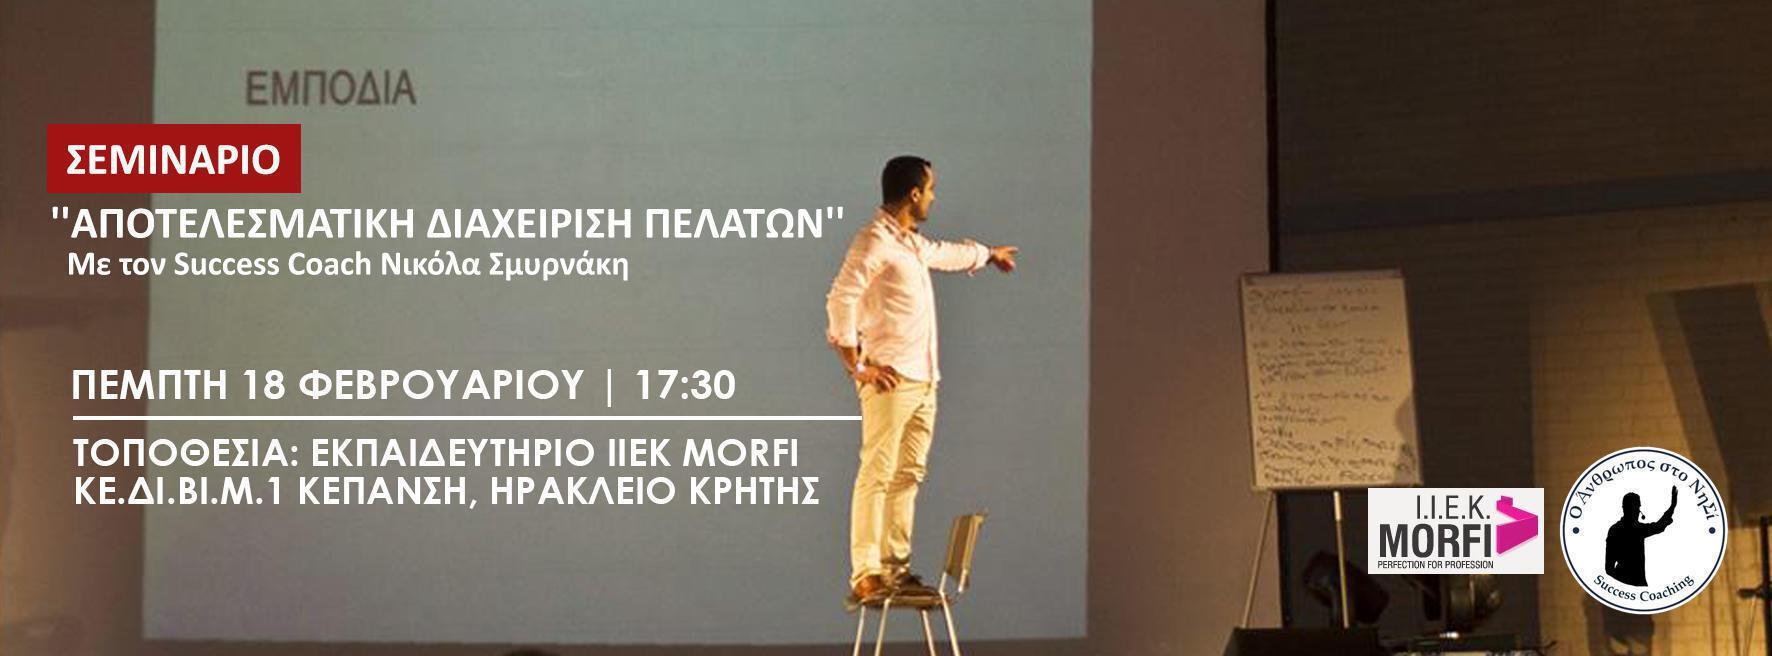 seminar_IEKMORFI2016